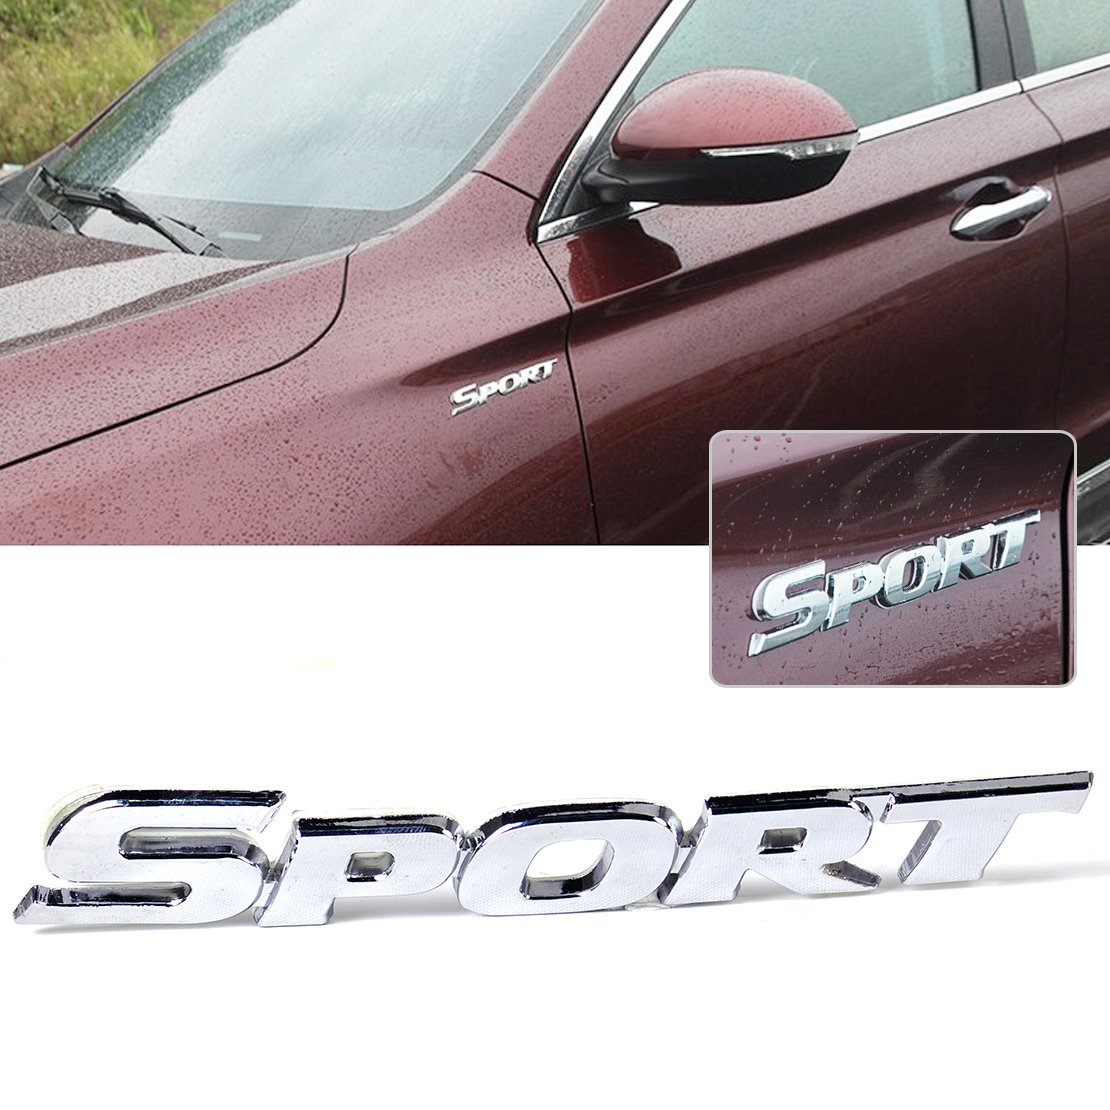 HUAYT 2Pack 3D Metal Car SPORT Sticker,Premium Car Side Fender Rear Trunk Emblem Logo Badge Decals Compatible for Ford//JEEP//BMW//Dodge Ram//Cadillac//Benz//Chrysler//Toyota//Nissan//Chevrolet-Matt Black